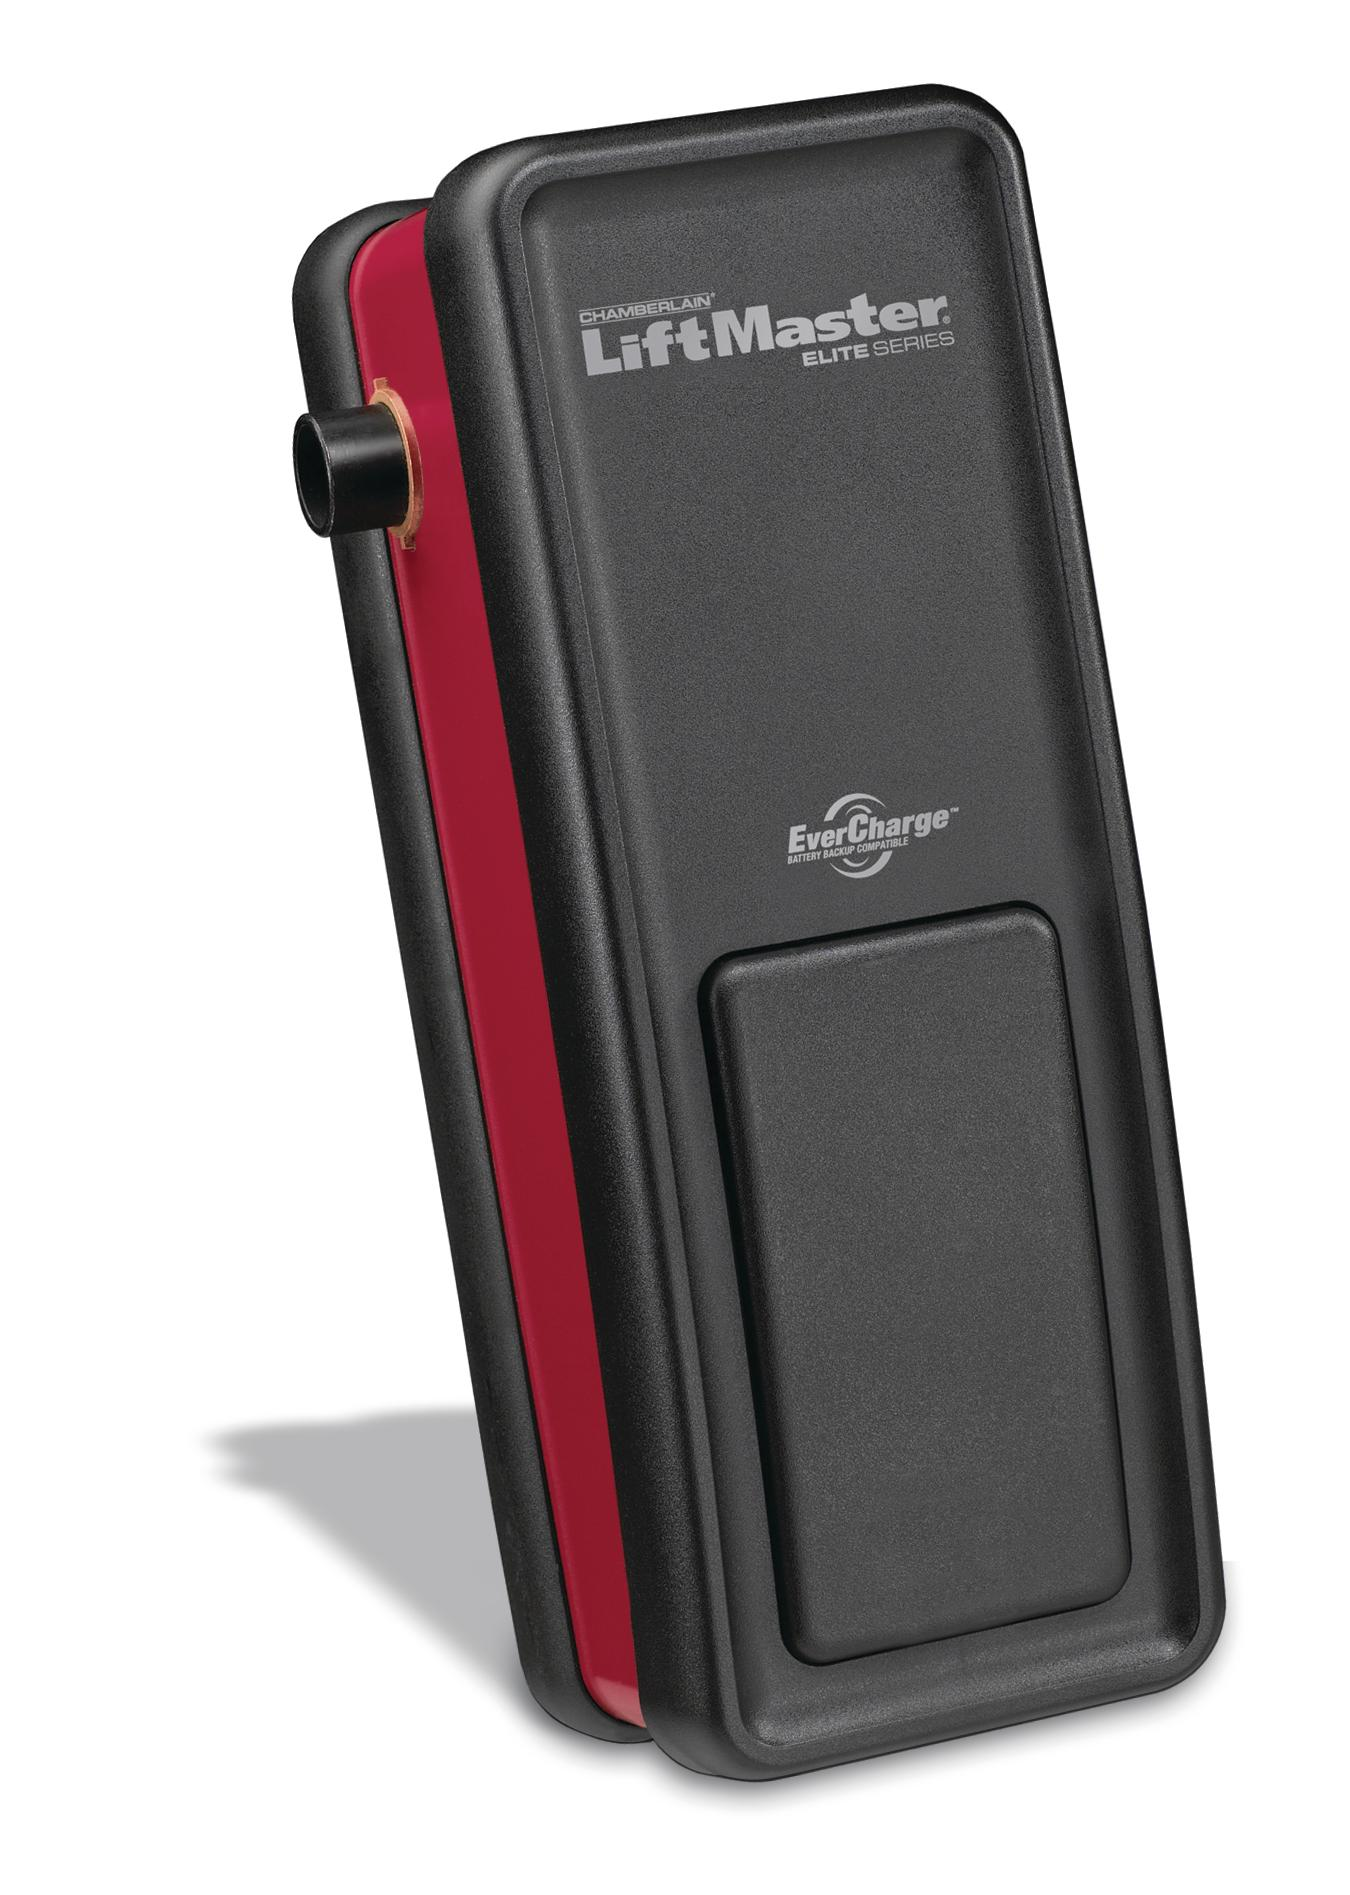 Chamberlain liftmaster residential jackshaft opener rjo 3800 remodeling doors parking lots - Chamberlain liftmaster garage door ...